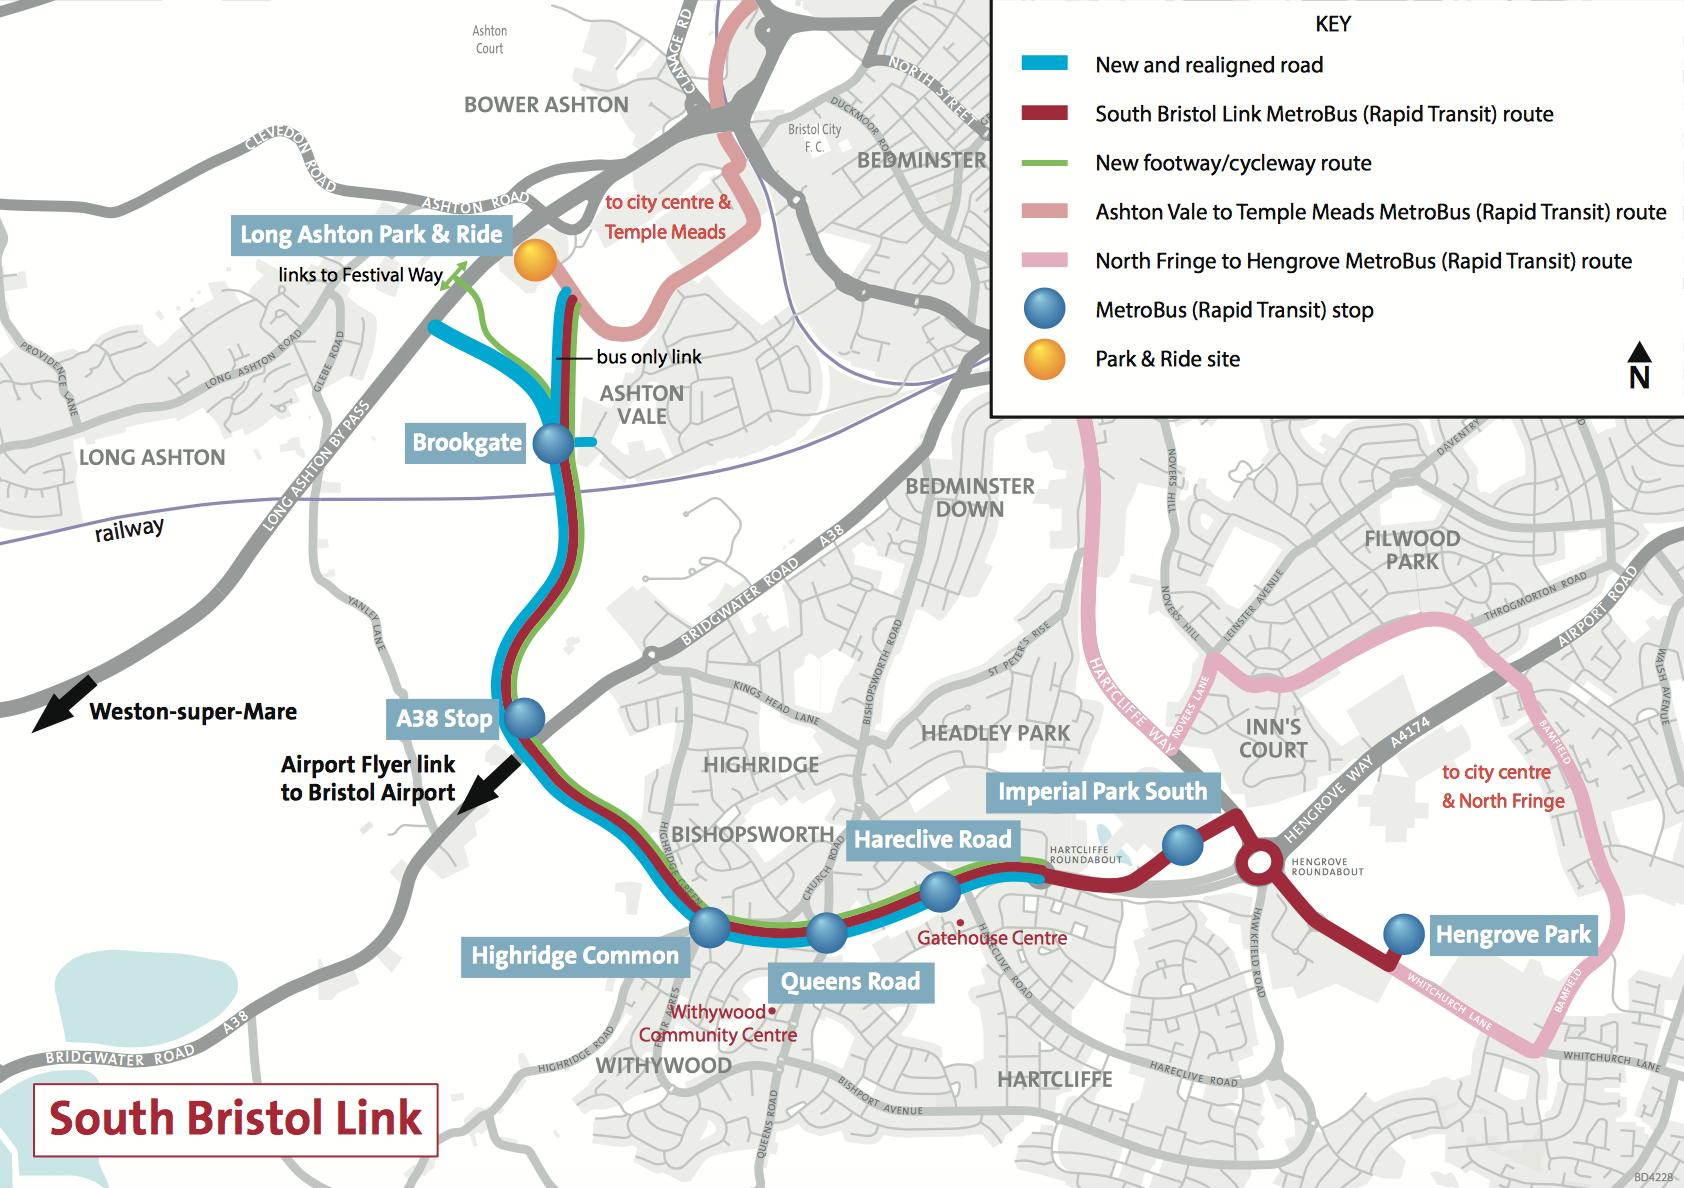 South Bristol Link